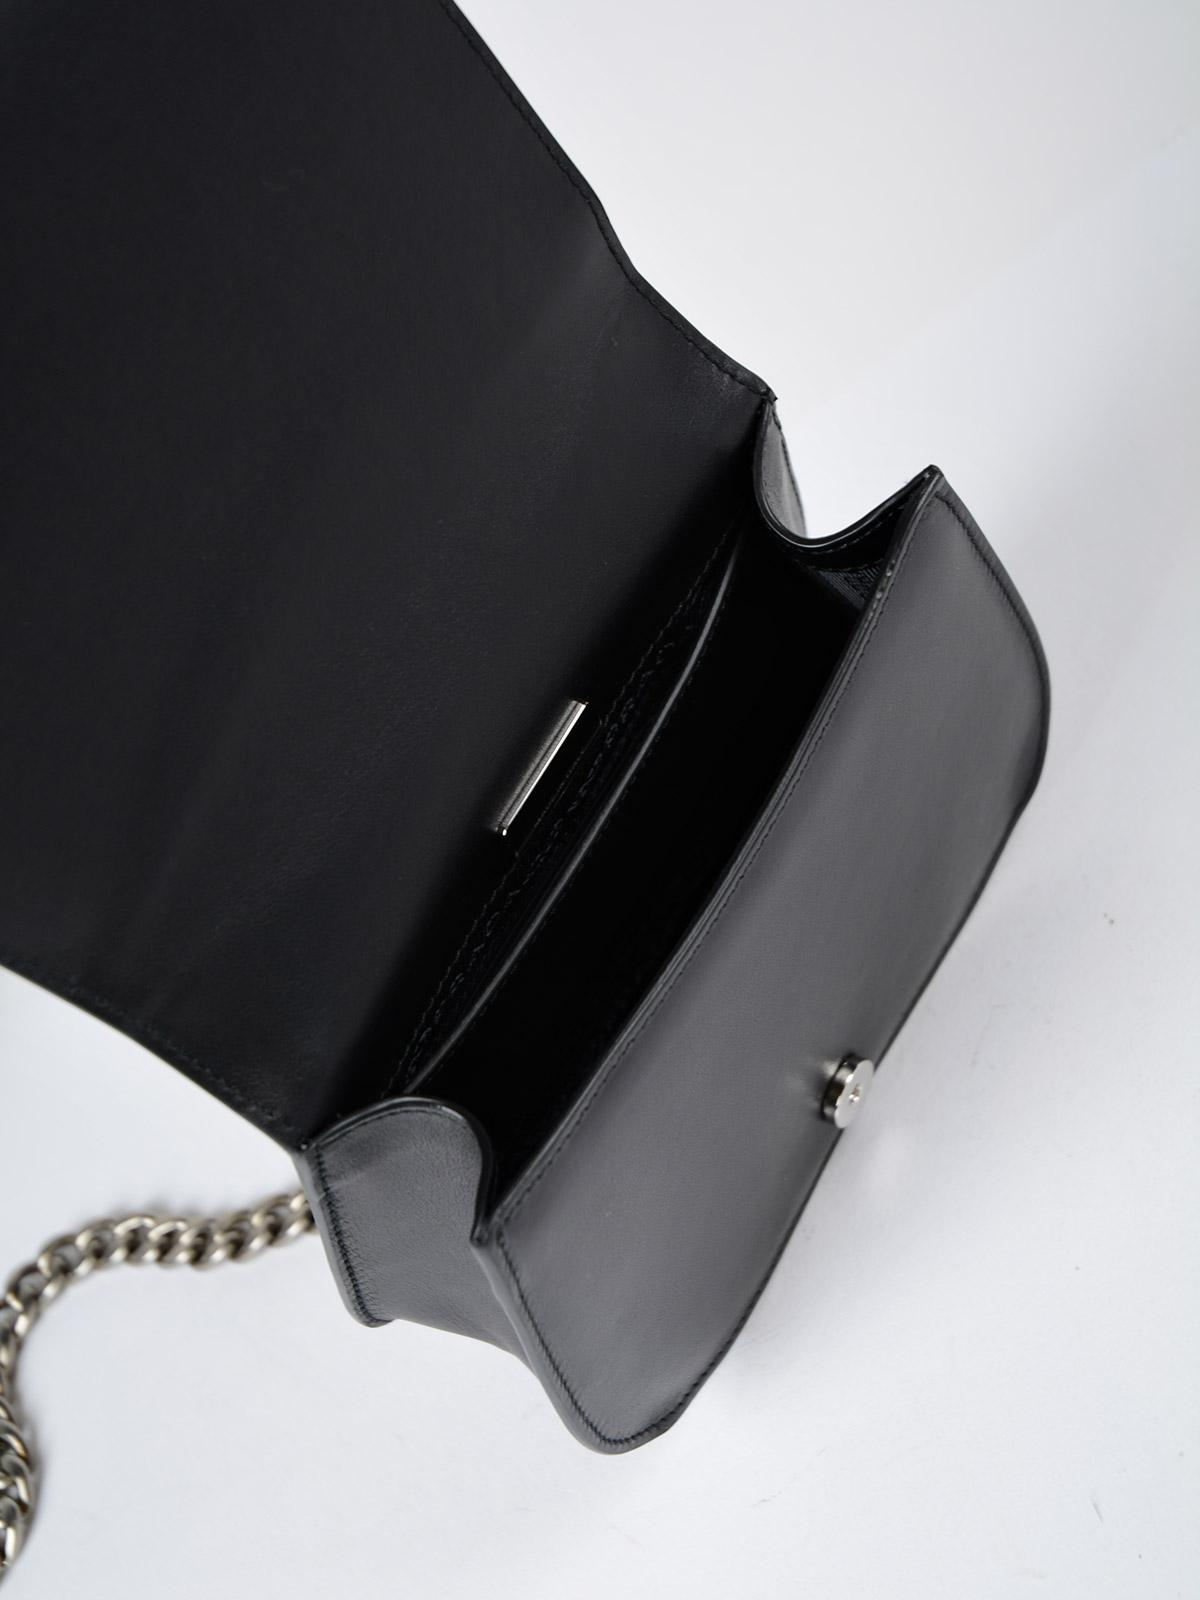 Prada Leather Antic Soft Crossbody in Black